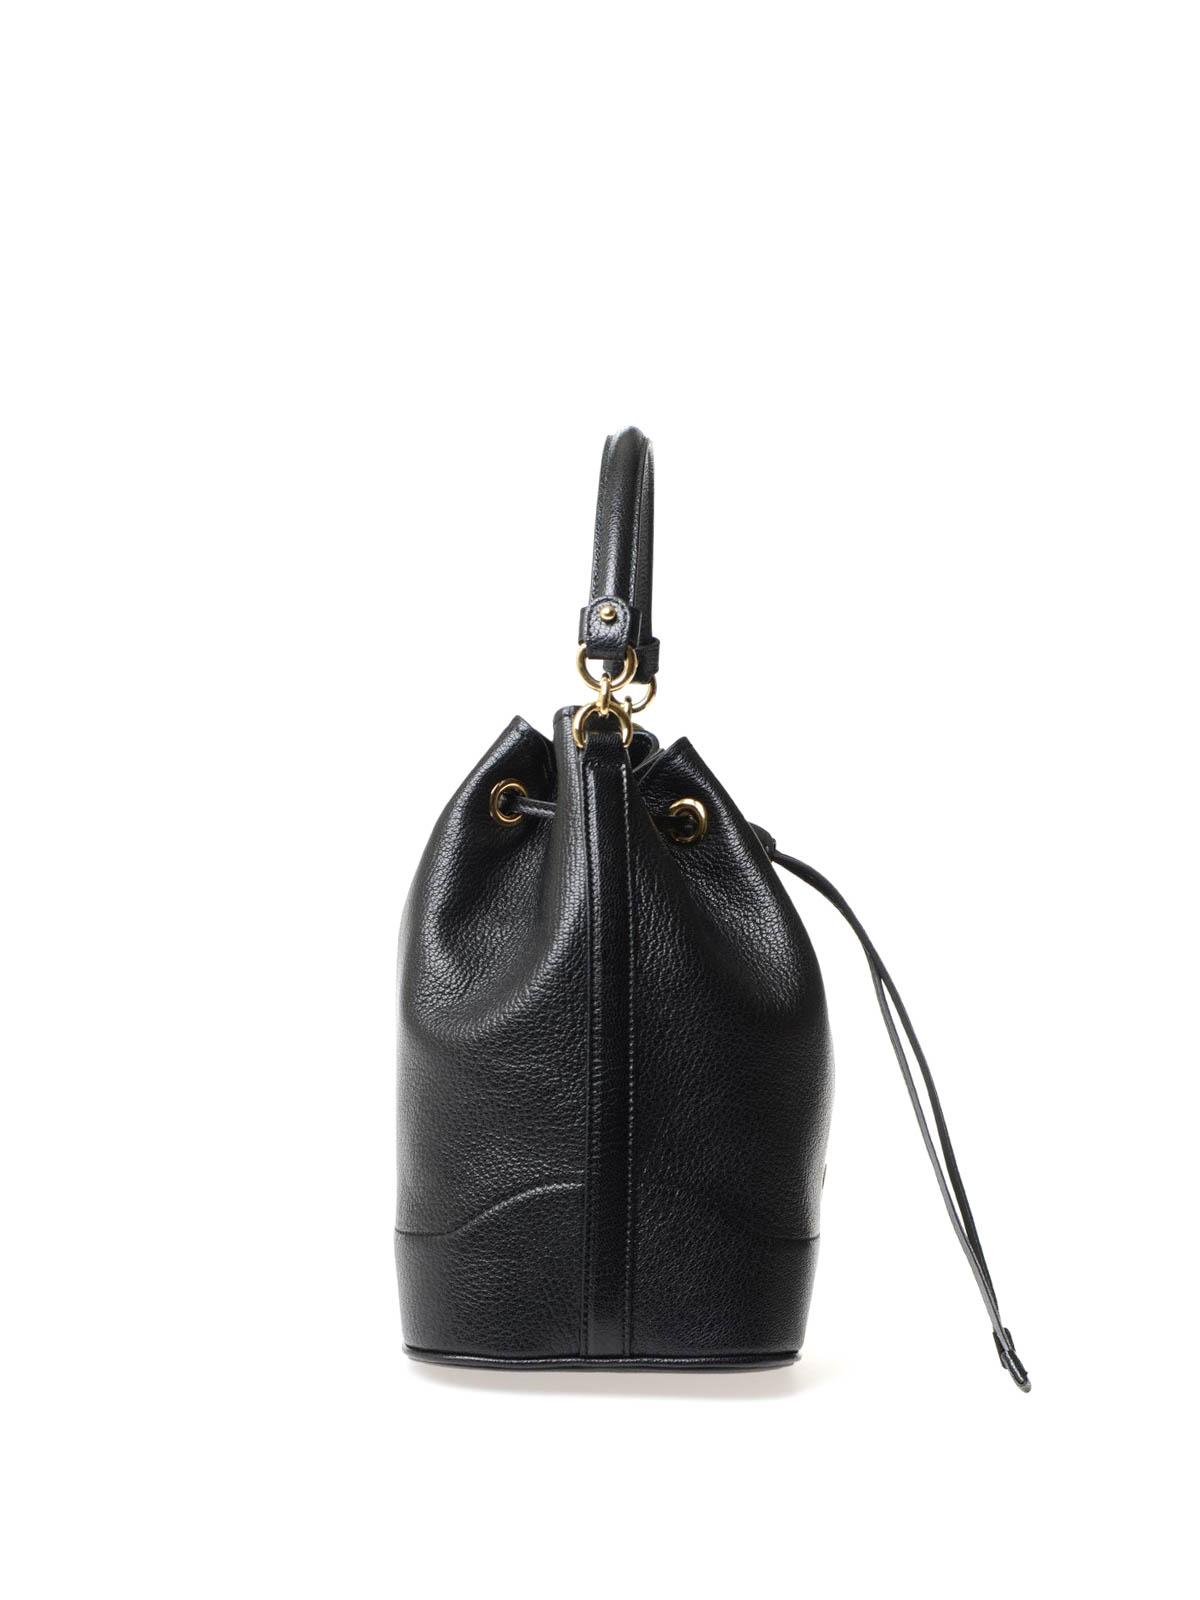 a21f977814f4 iKRIX SALVATORE FERRAGAMO  Bucket-bags - Bucket-Bag Millie - Schwarz